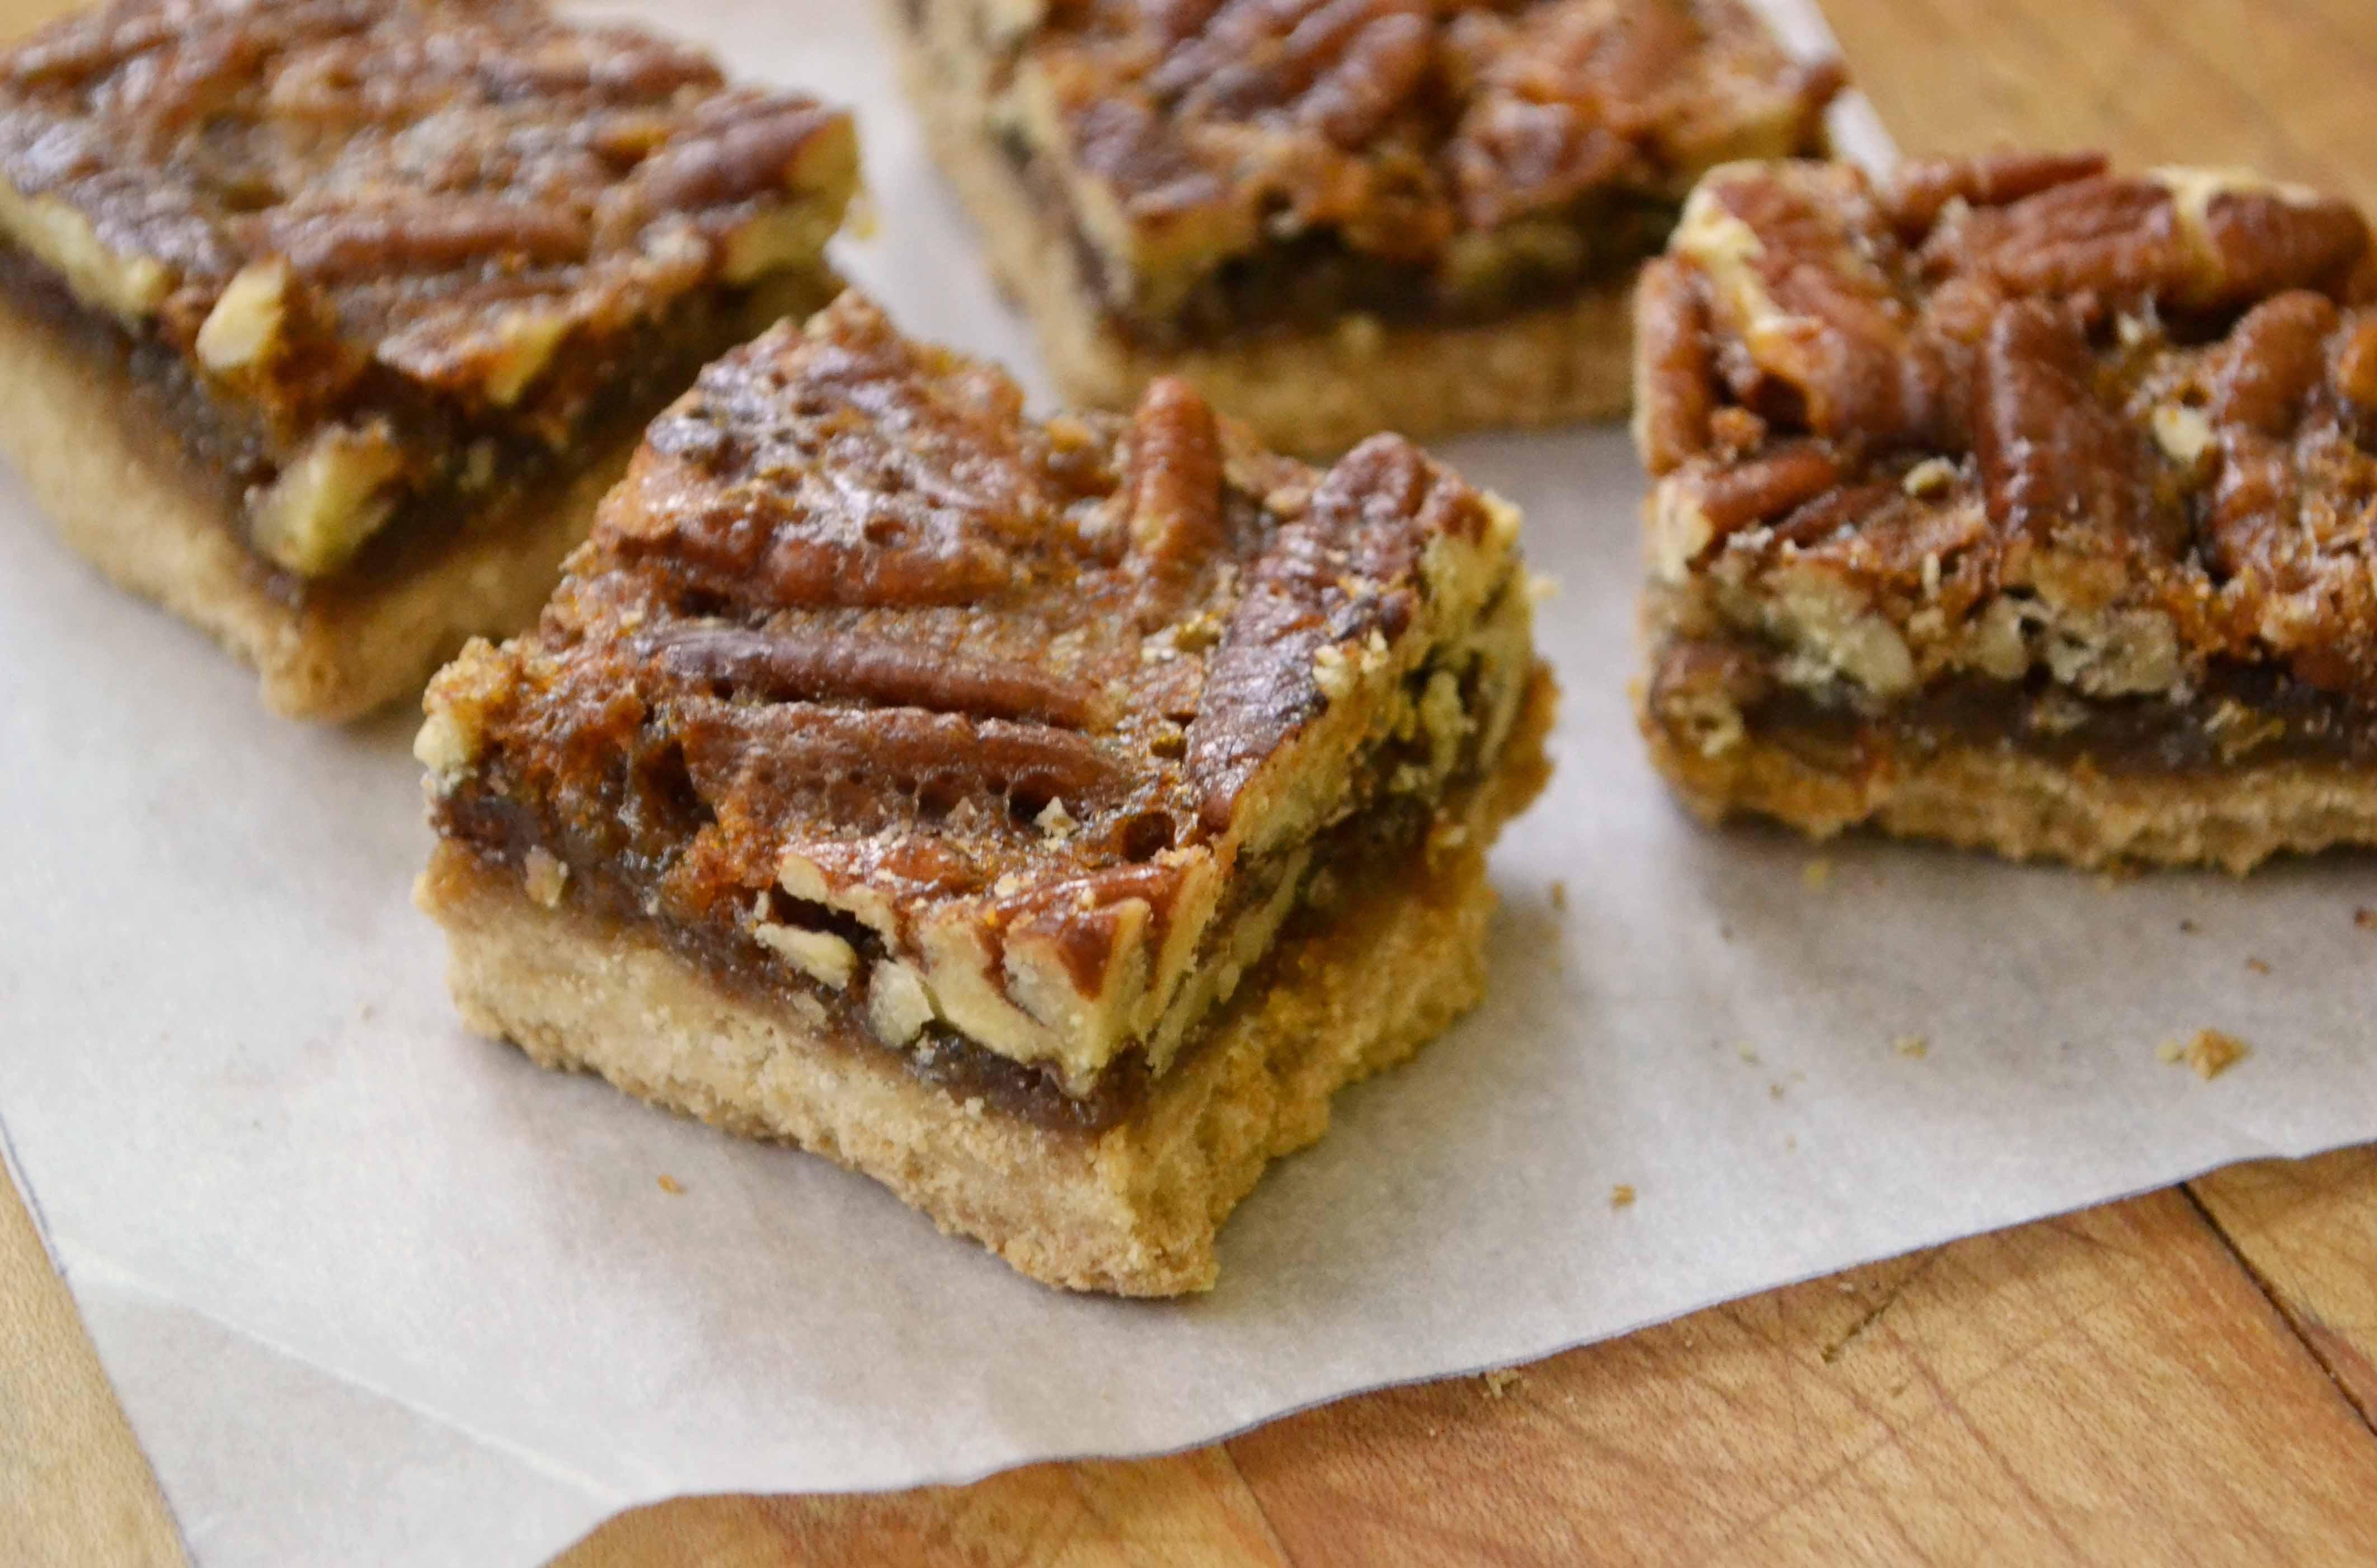 Eat Pecan Pie With Less Guilt